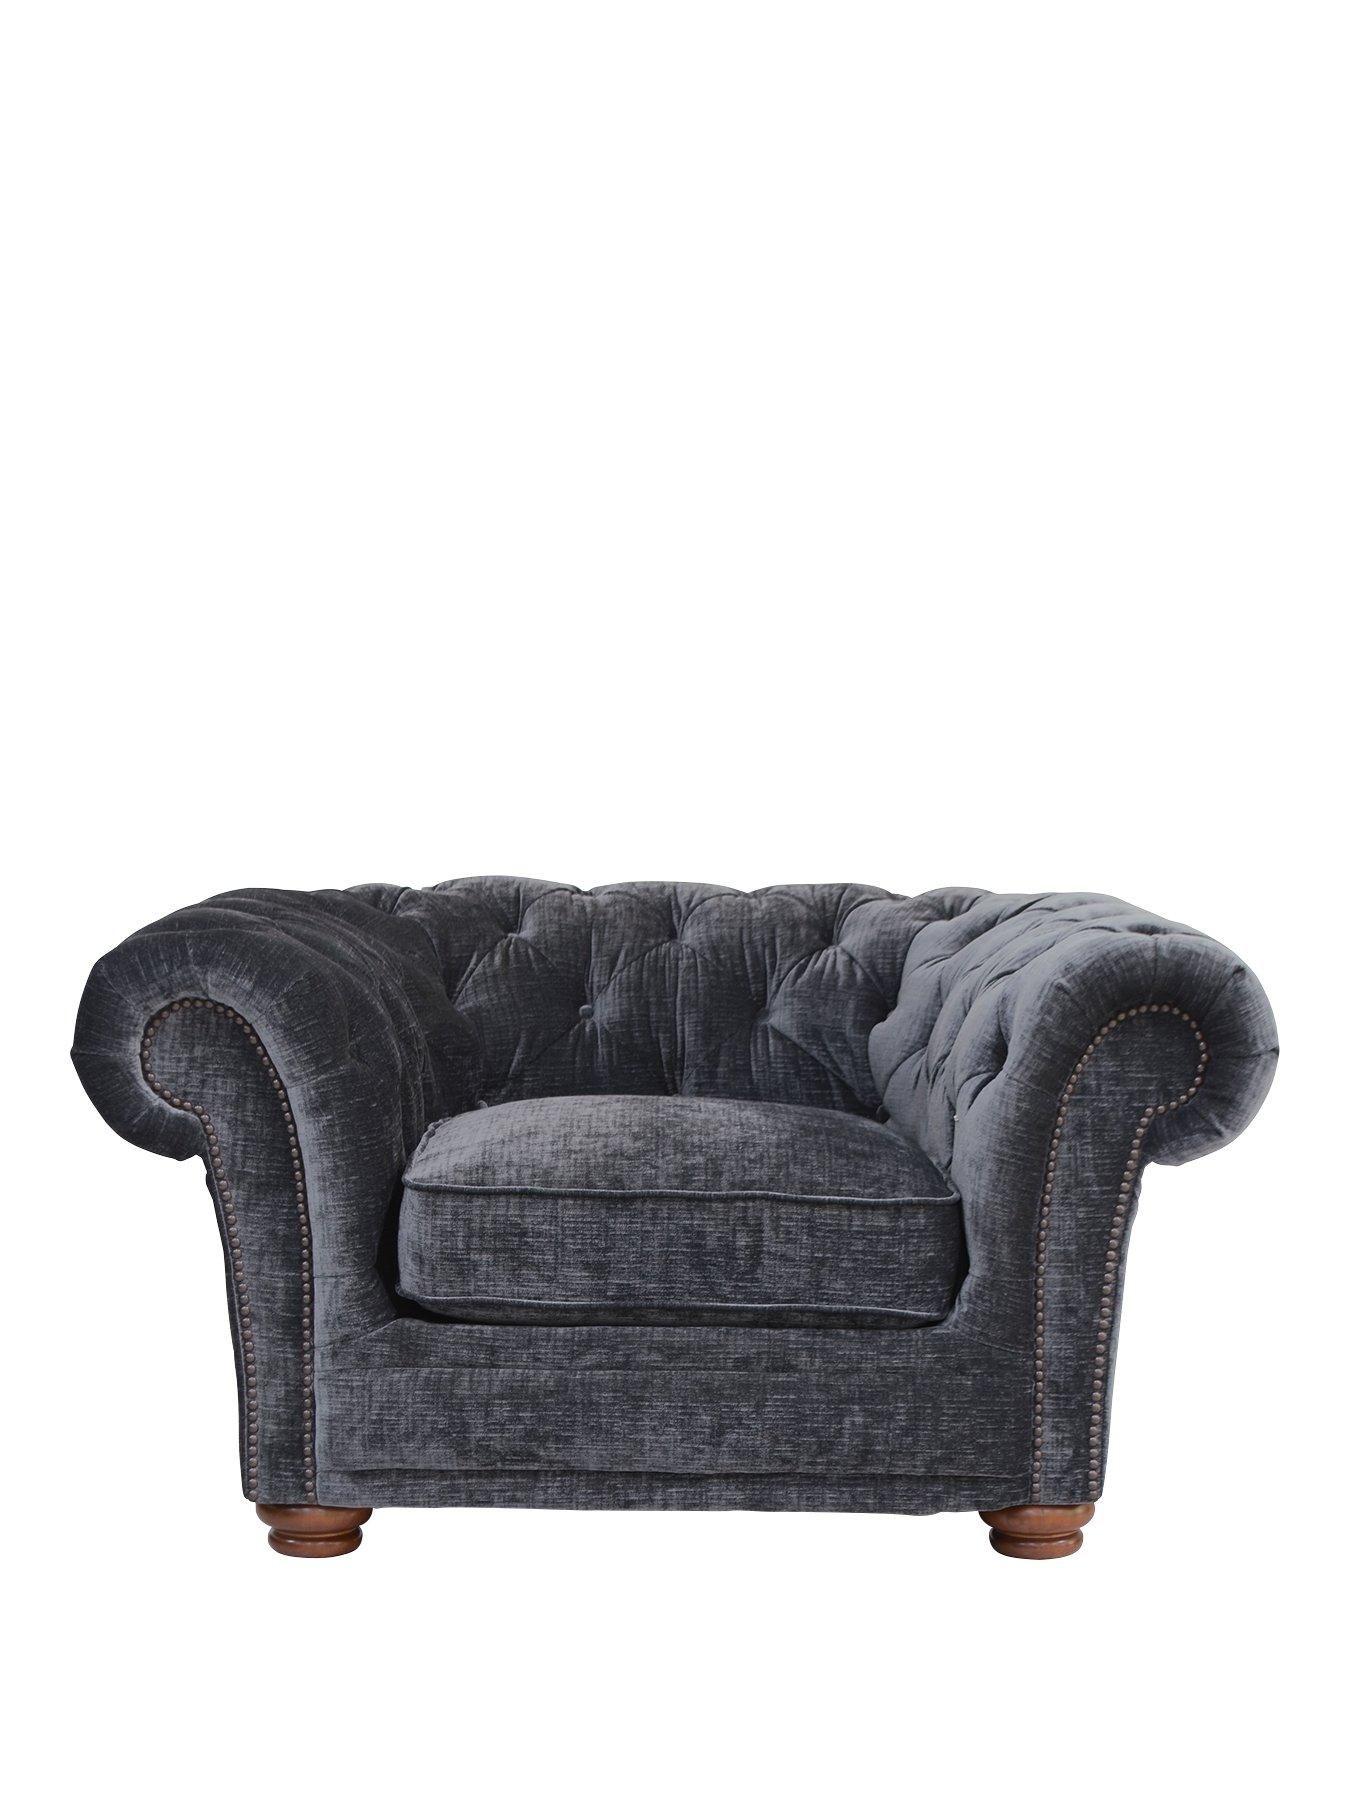 Bardon Fabric Armchair | Fabric armchairs, Living room storage and ...